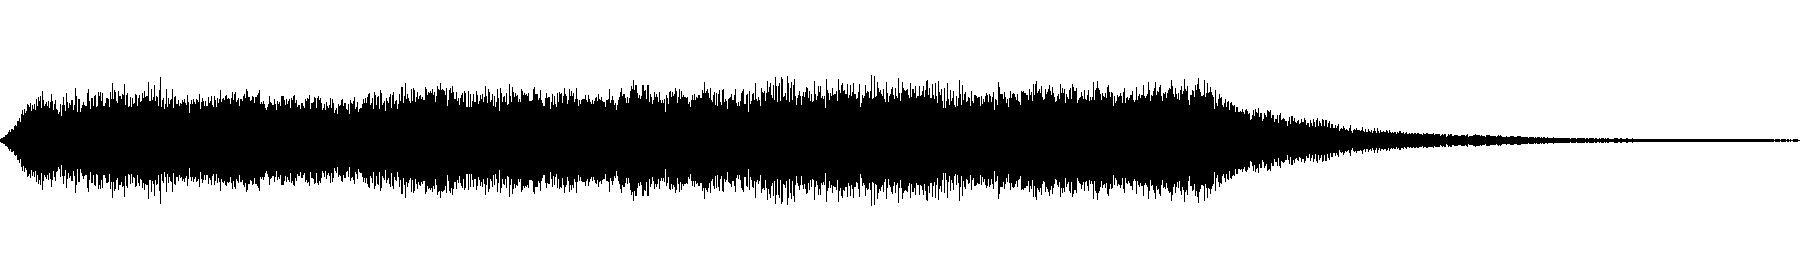 organ dsus4